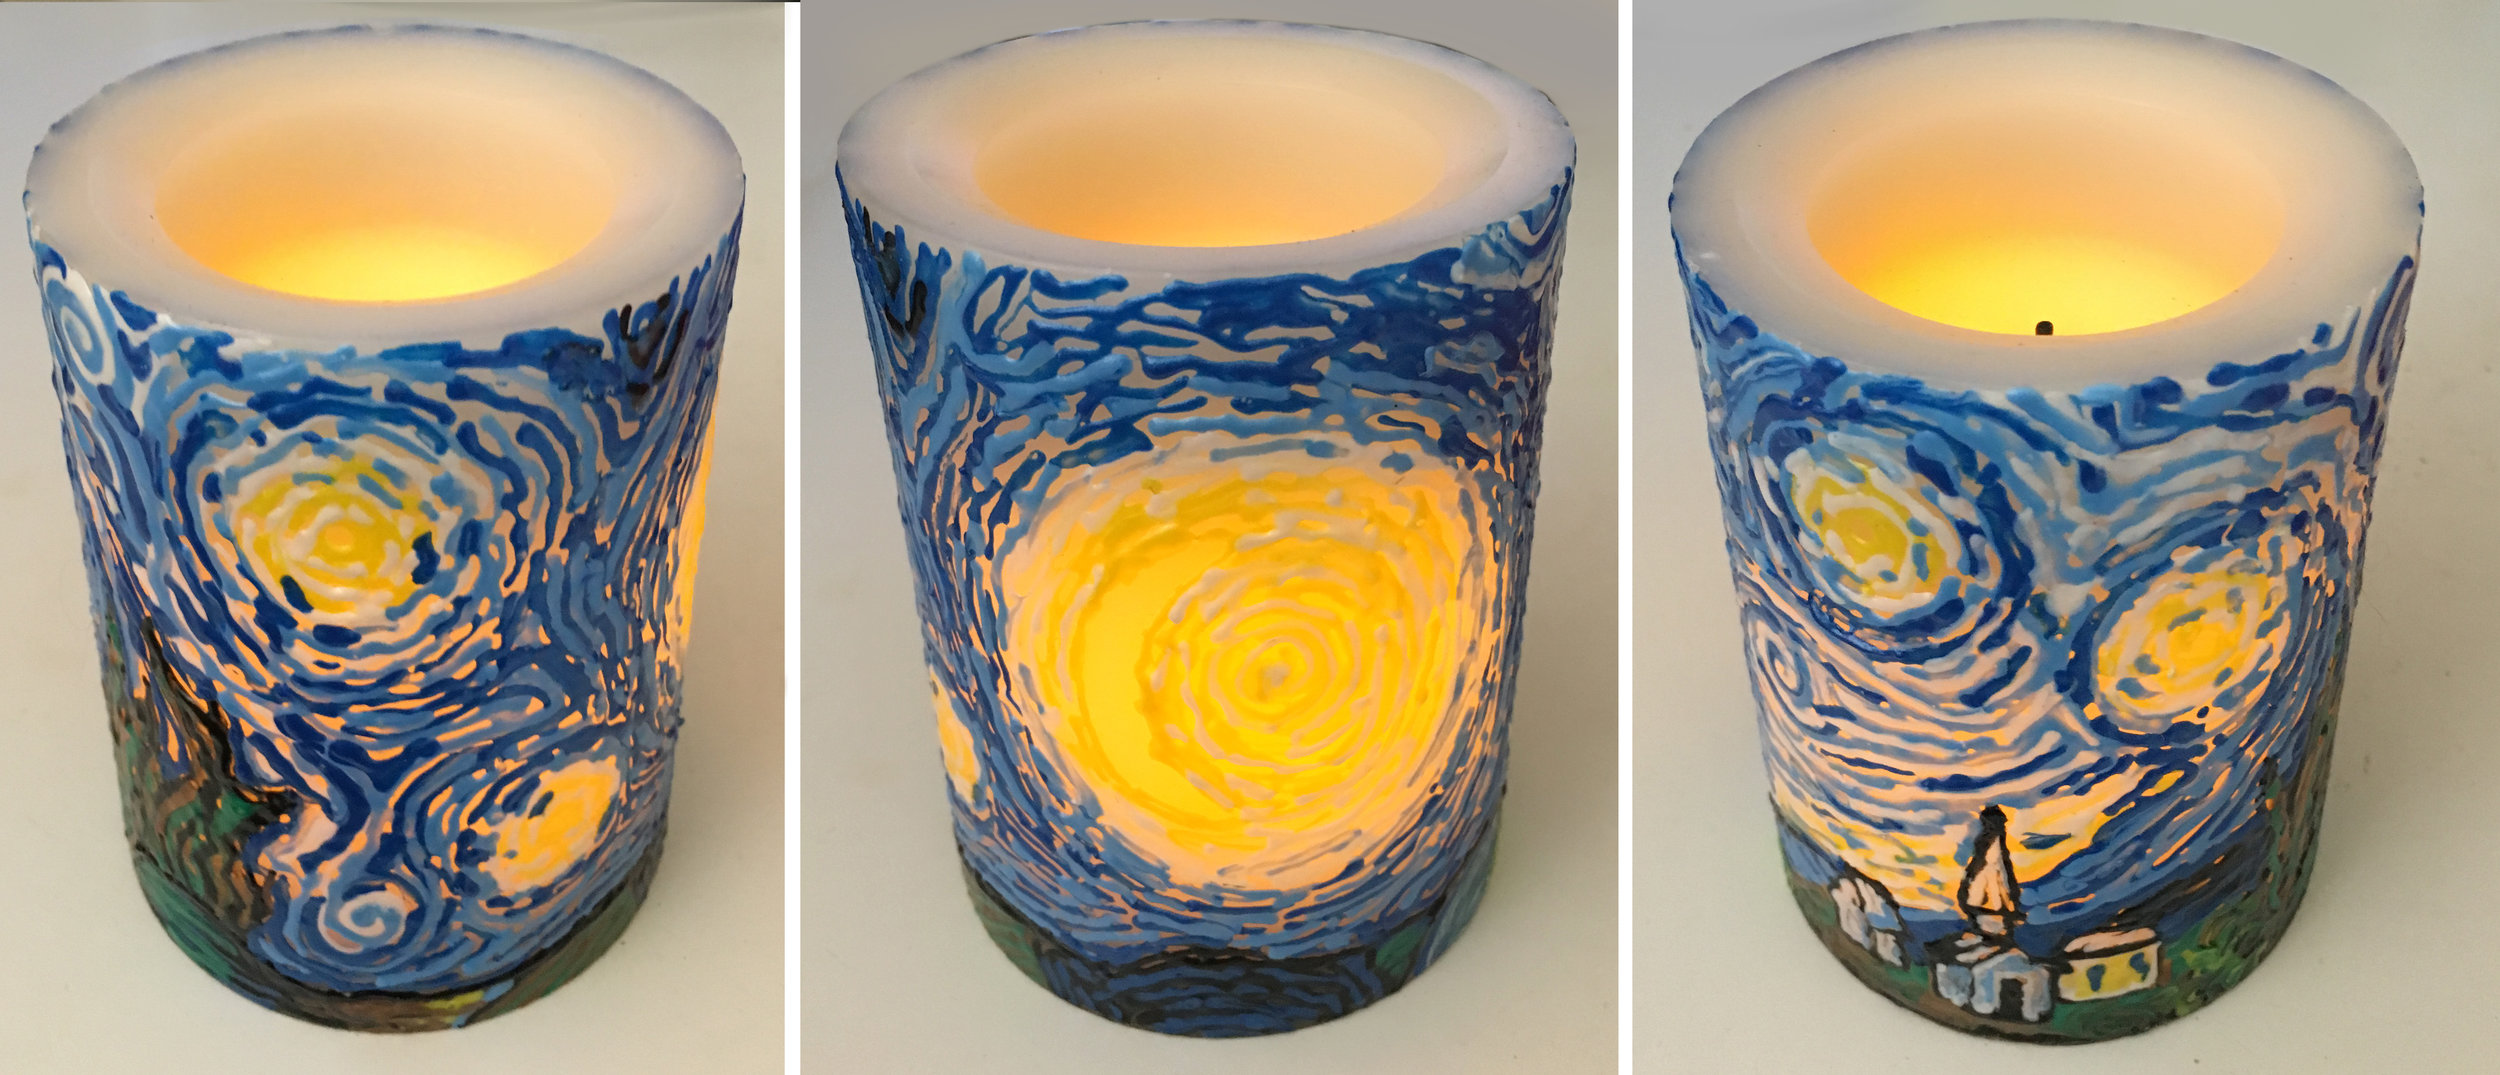 29-Marabu-Candle-Liner-How-To-Gayle-Mahoney.jpg